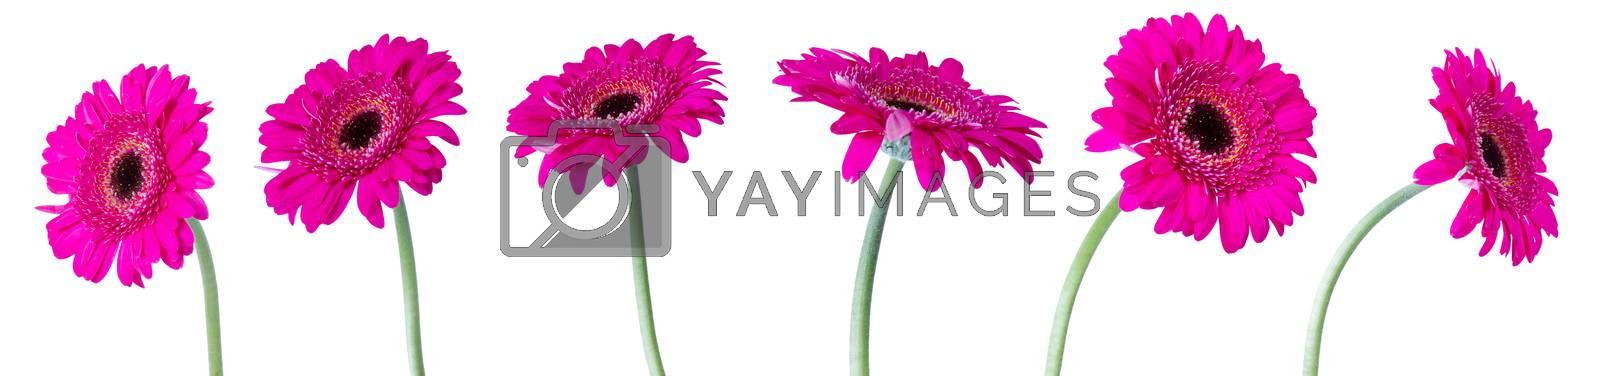 Gerbera flowers on white background